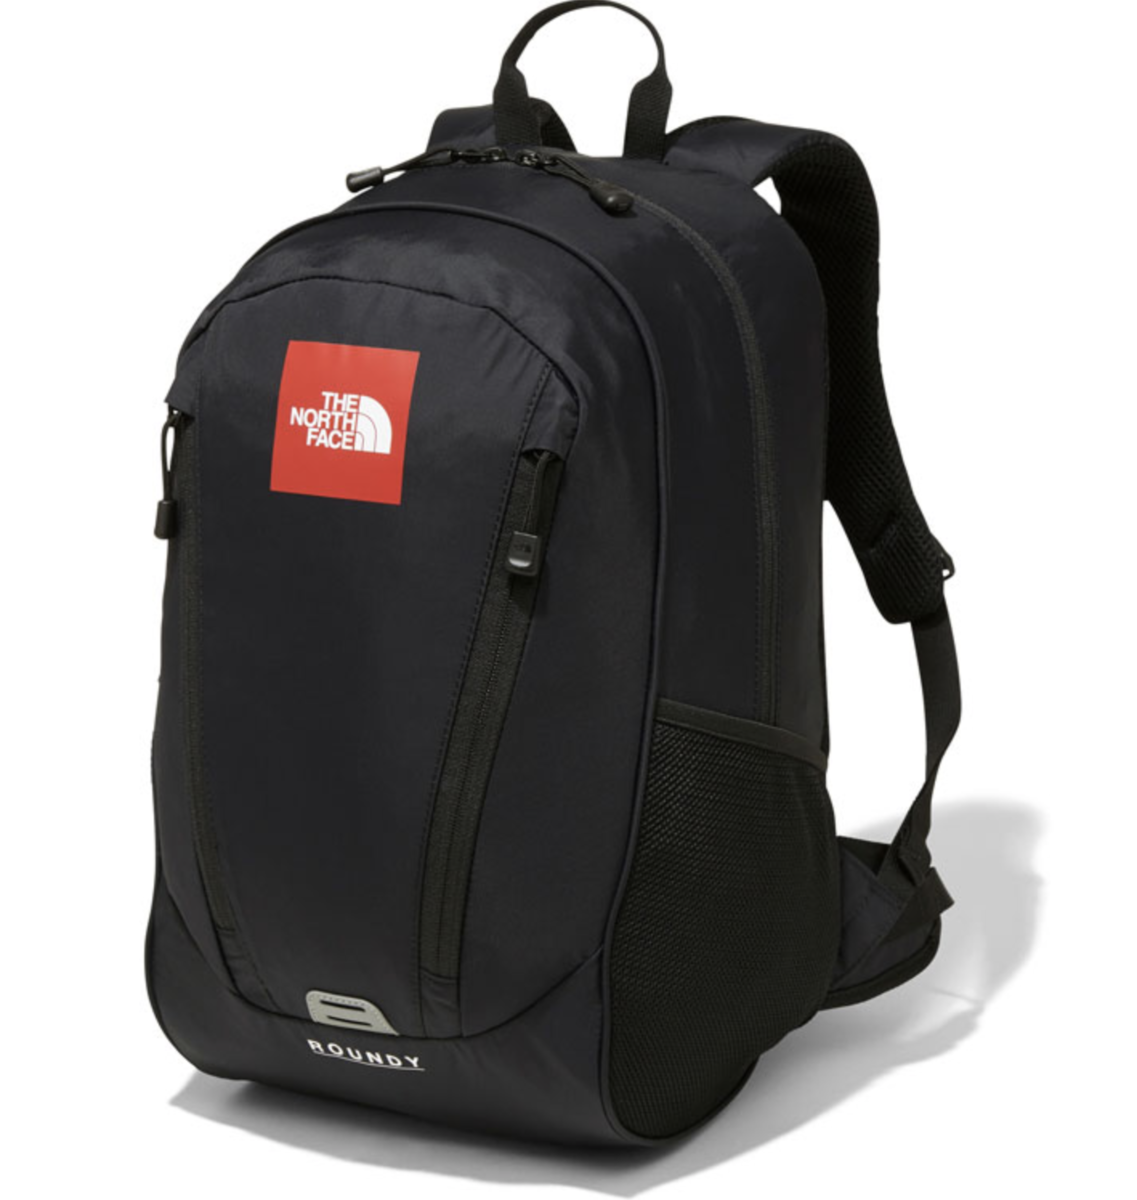 f:id:thebackpack:20191010185858p:plain